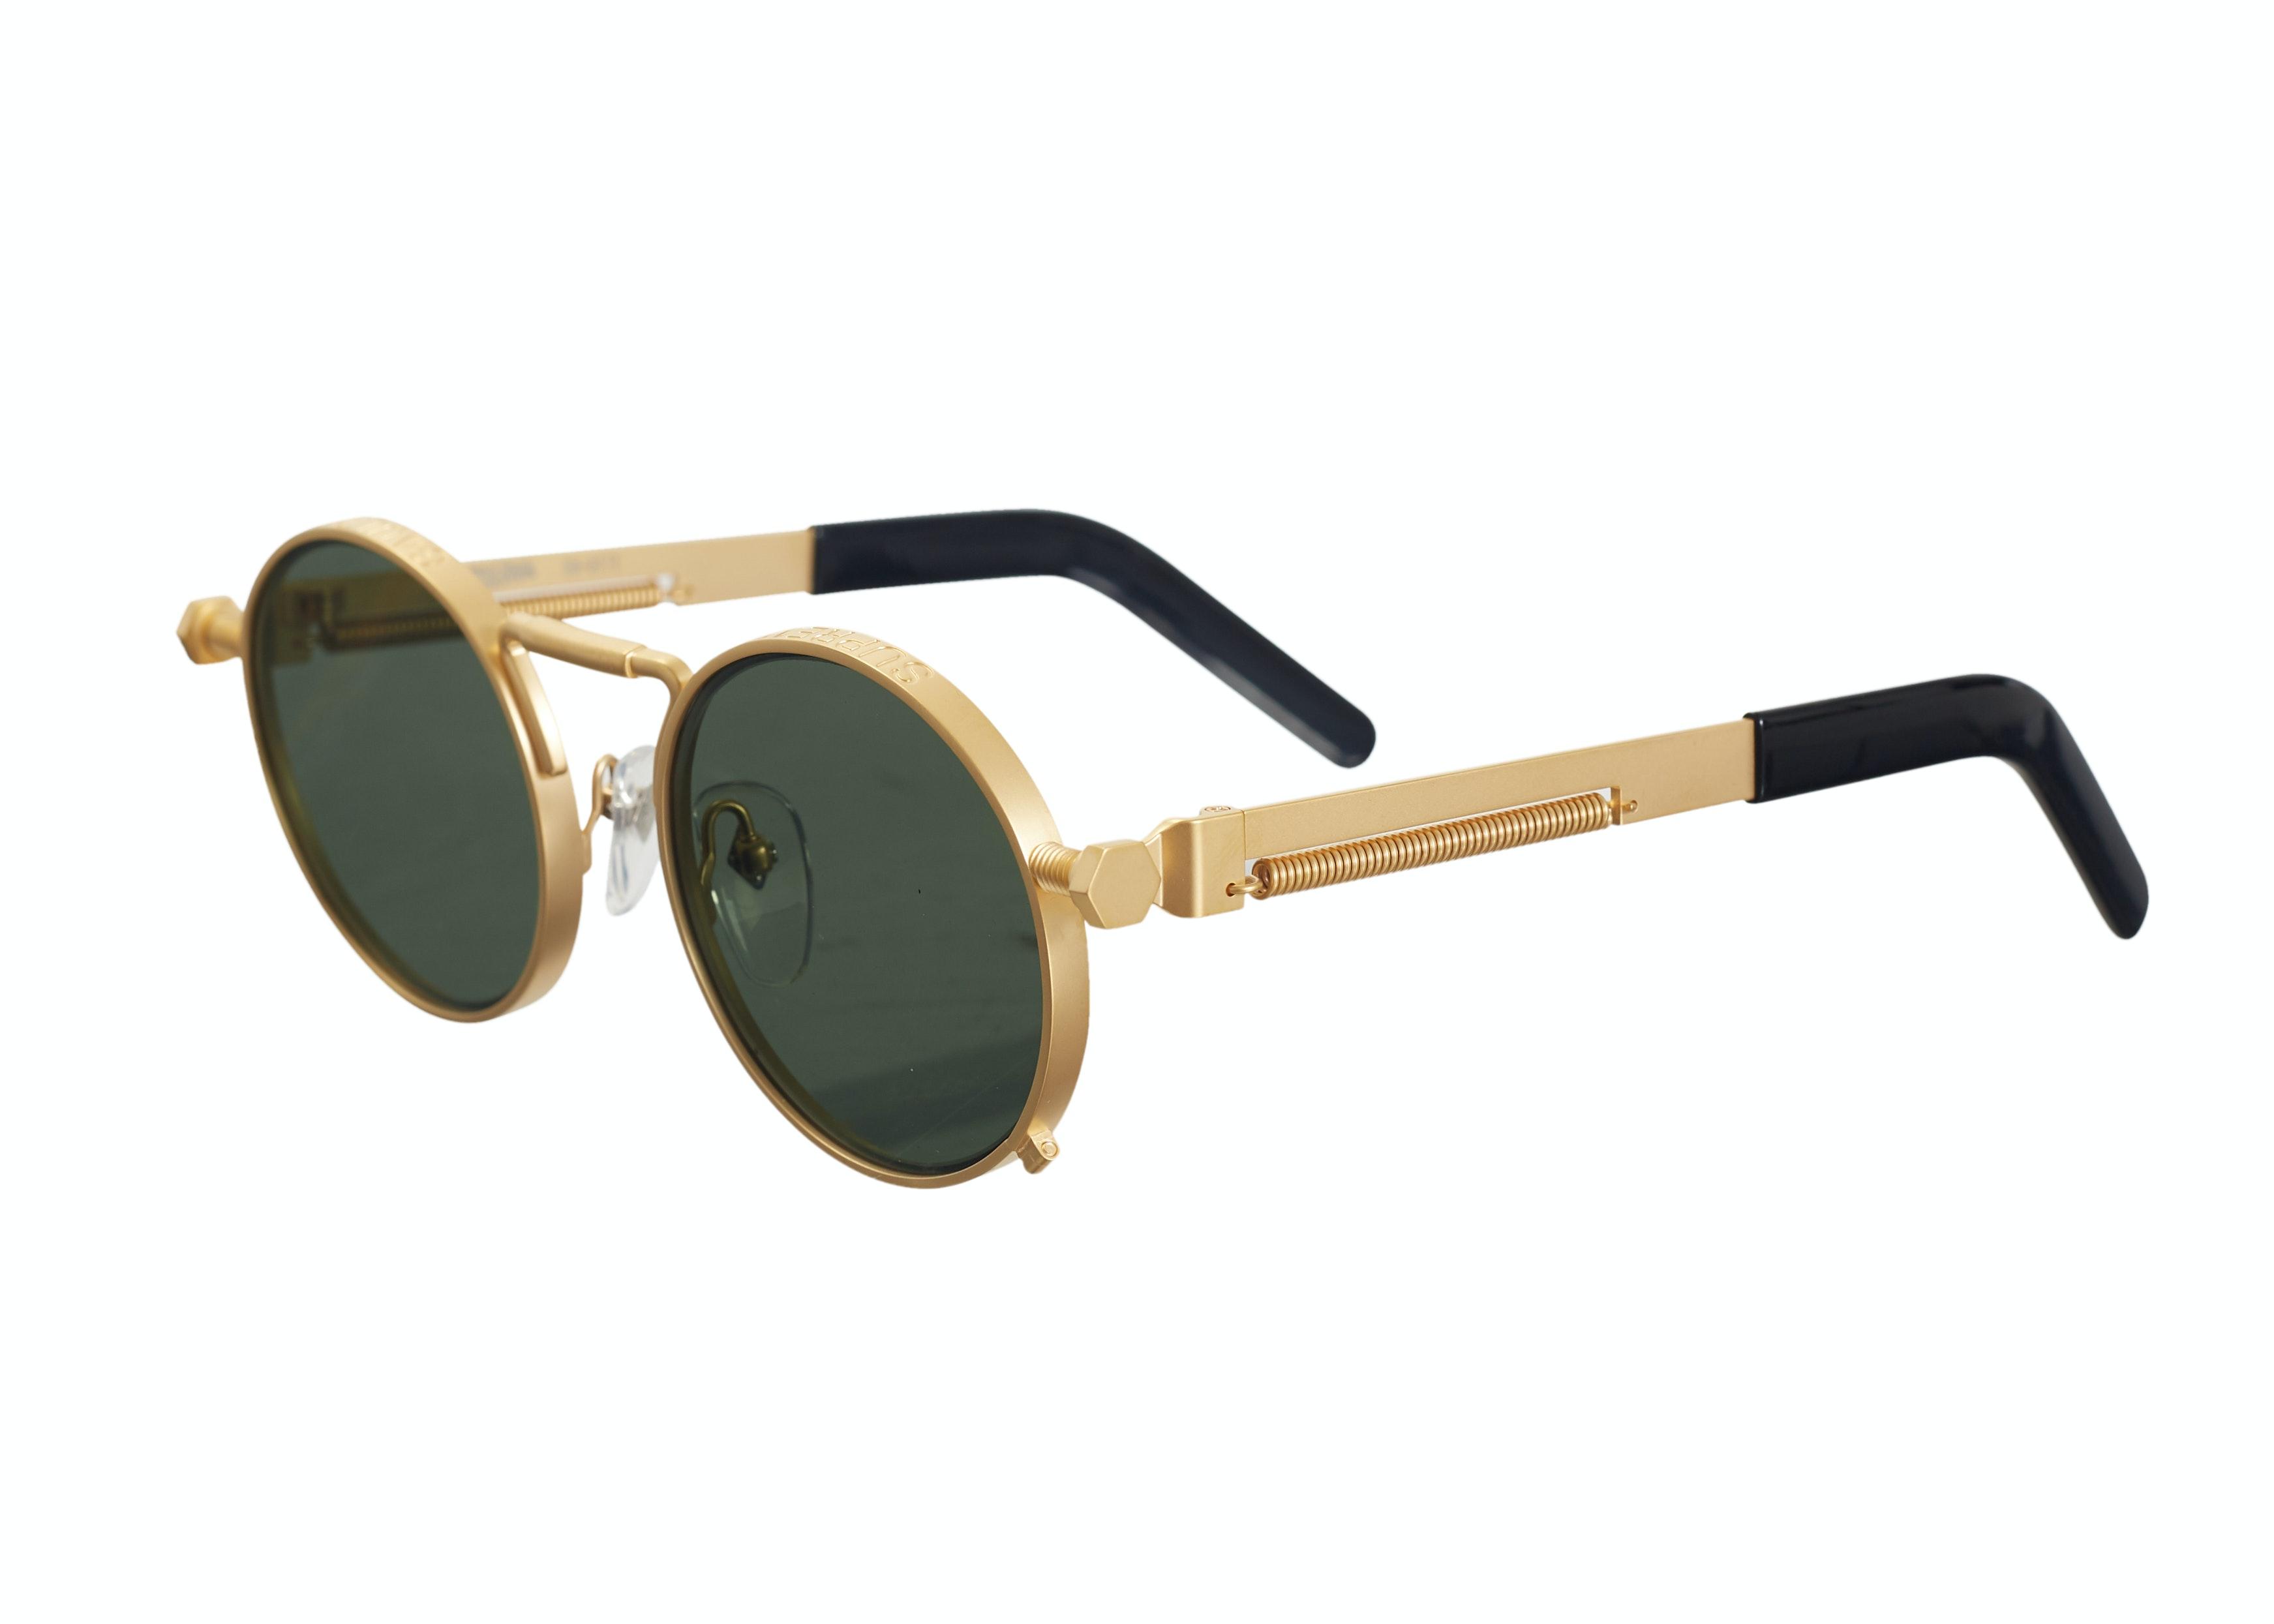 Supreme Jean Paul Gaultier Sunglasses Gold